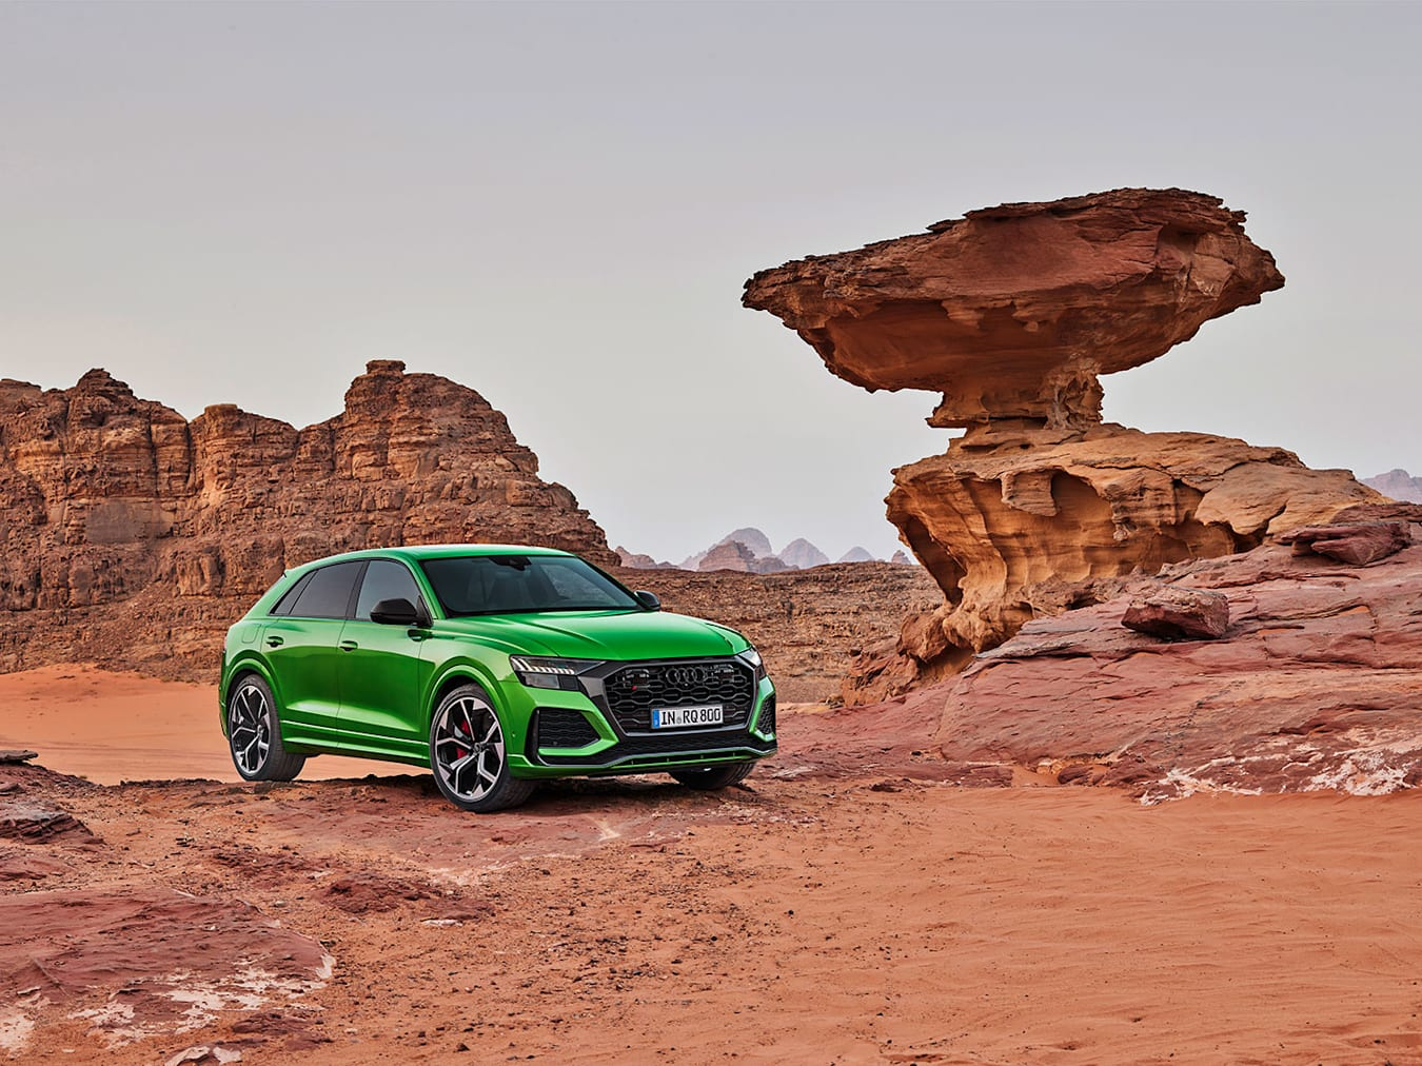 Audi RS Q8 Off-road